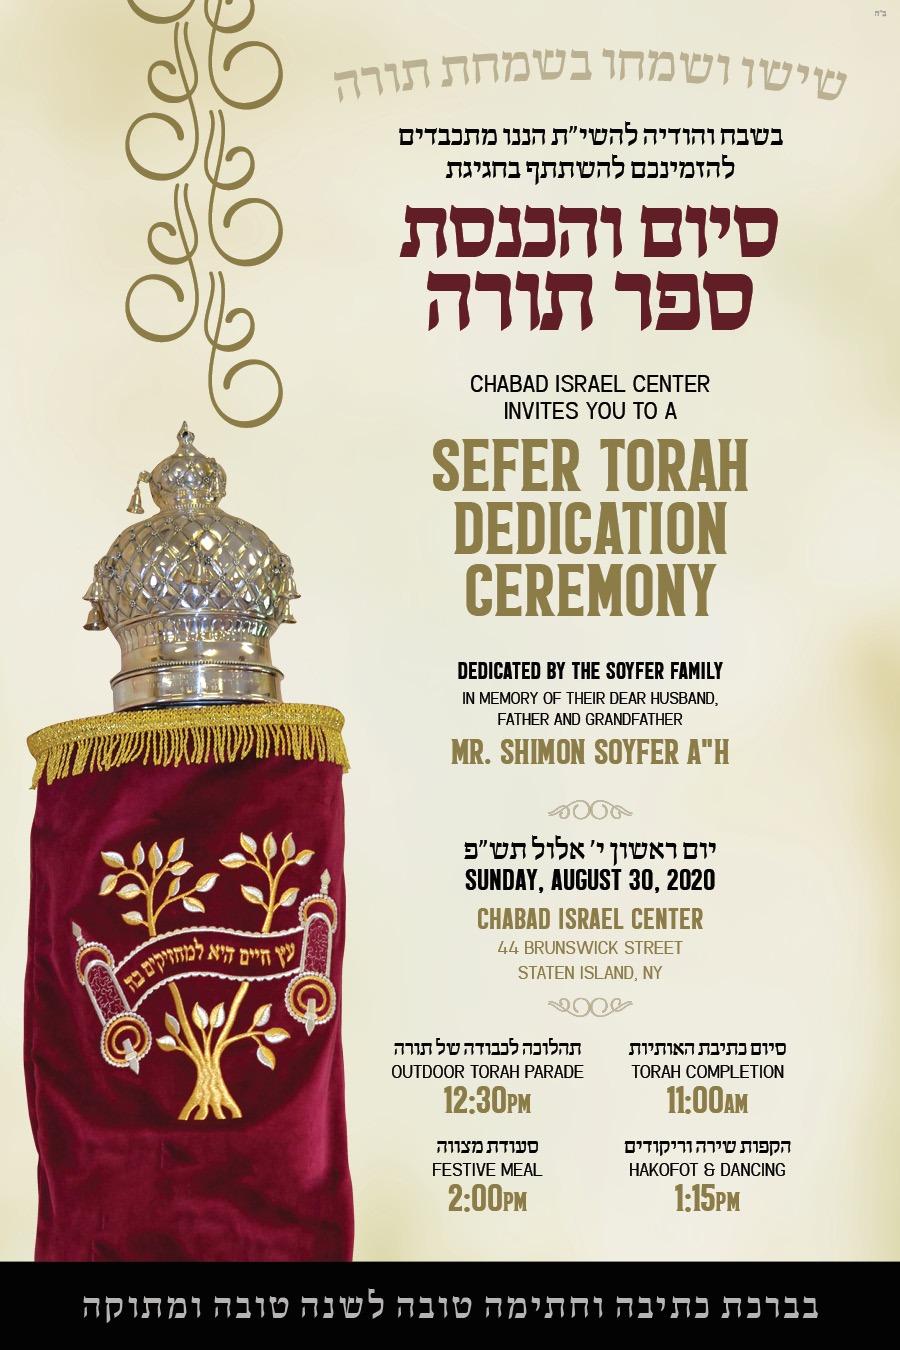 Hachnosat Sefer Torah - Soyfer